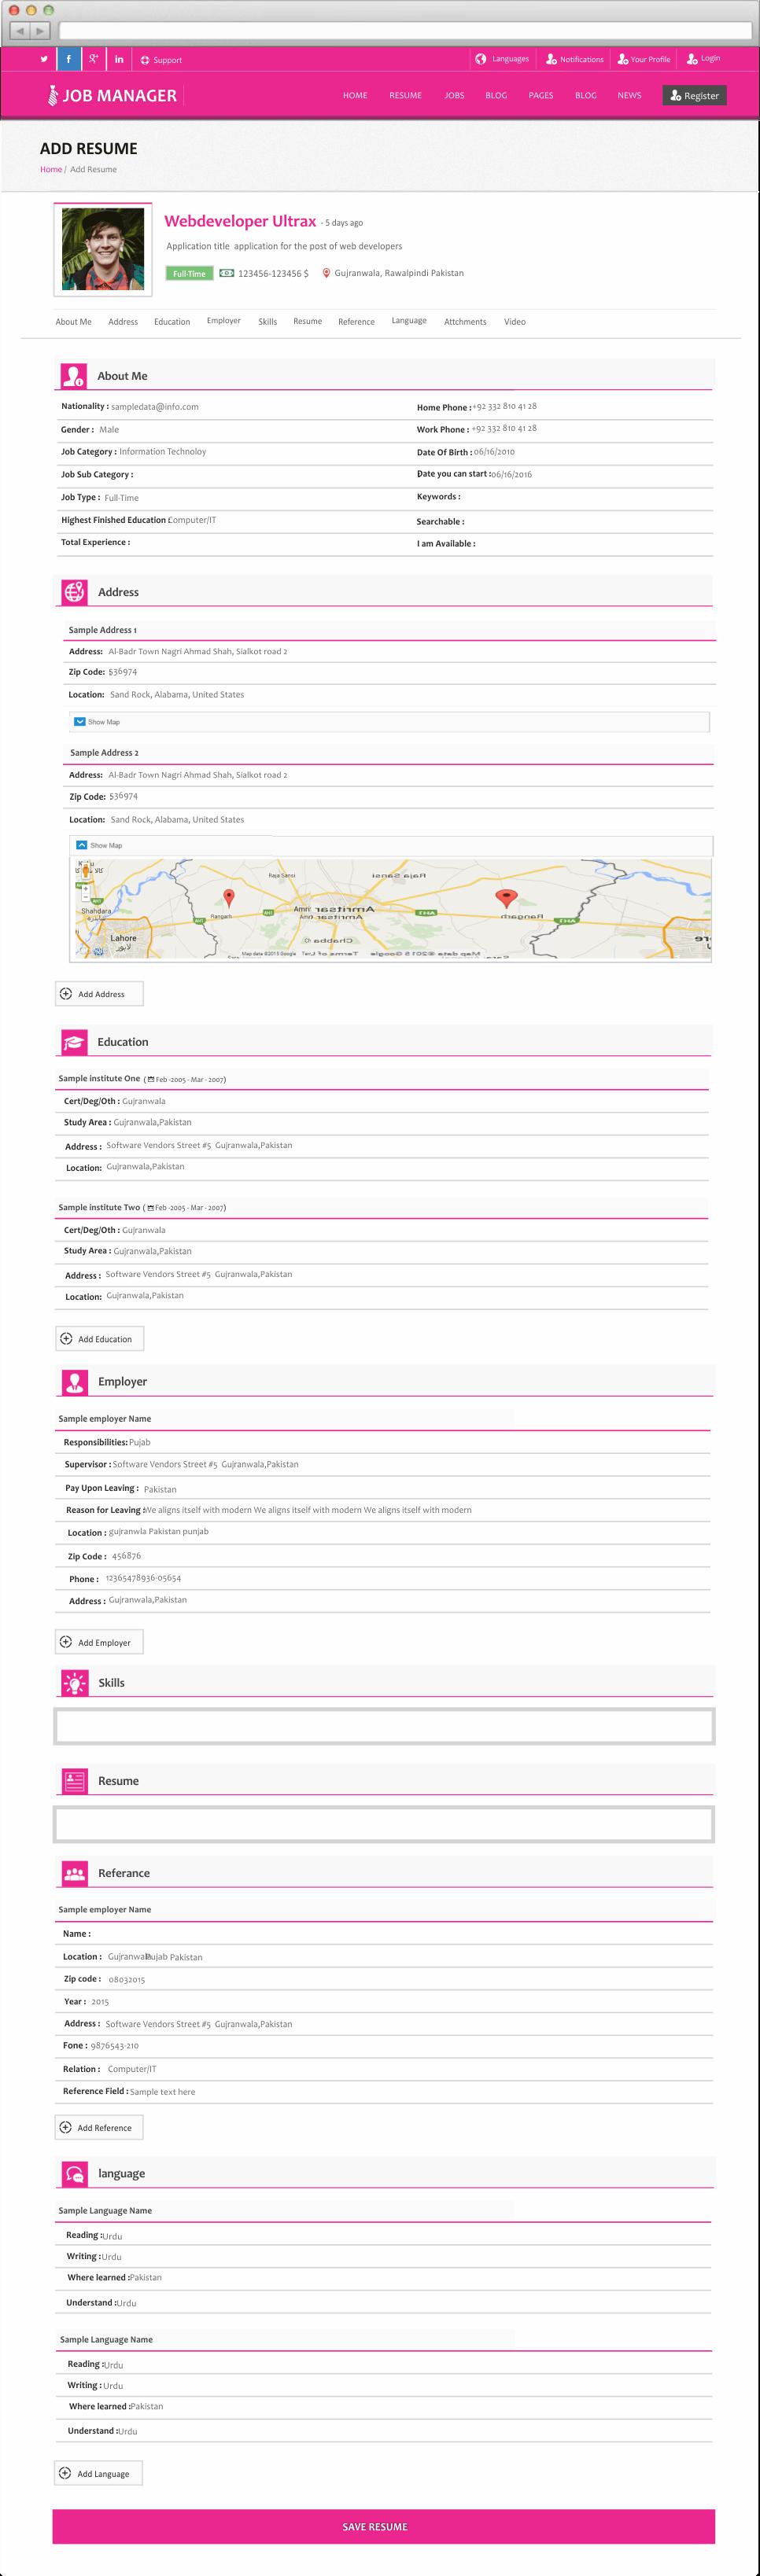 edit resume